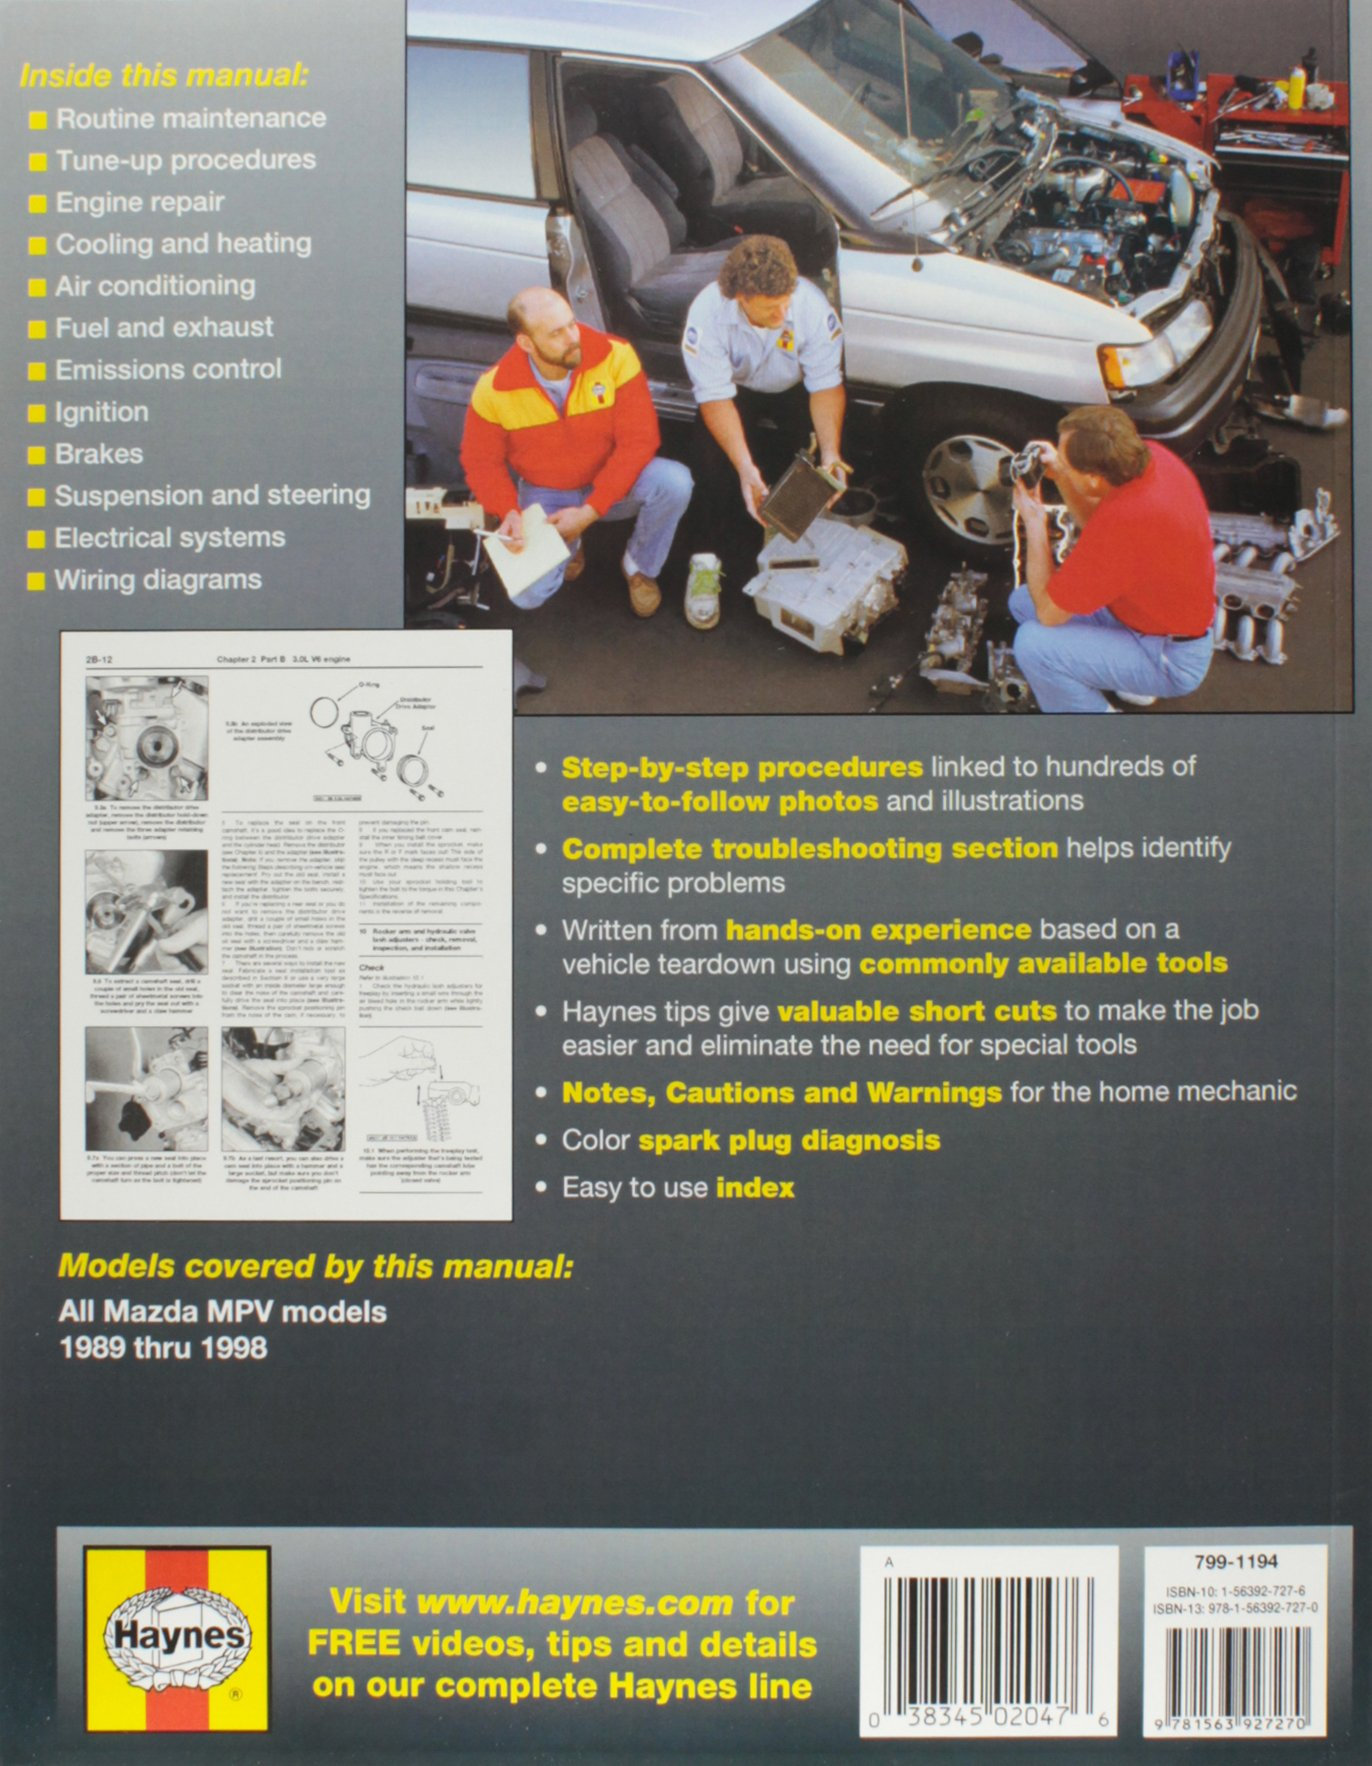 Mazda MPV 1989-1998 (Haynes Service & Repair Manual): Editors Haynes:  9781563927270: Amazon.com: Books